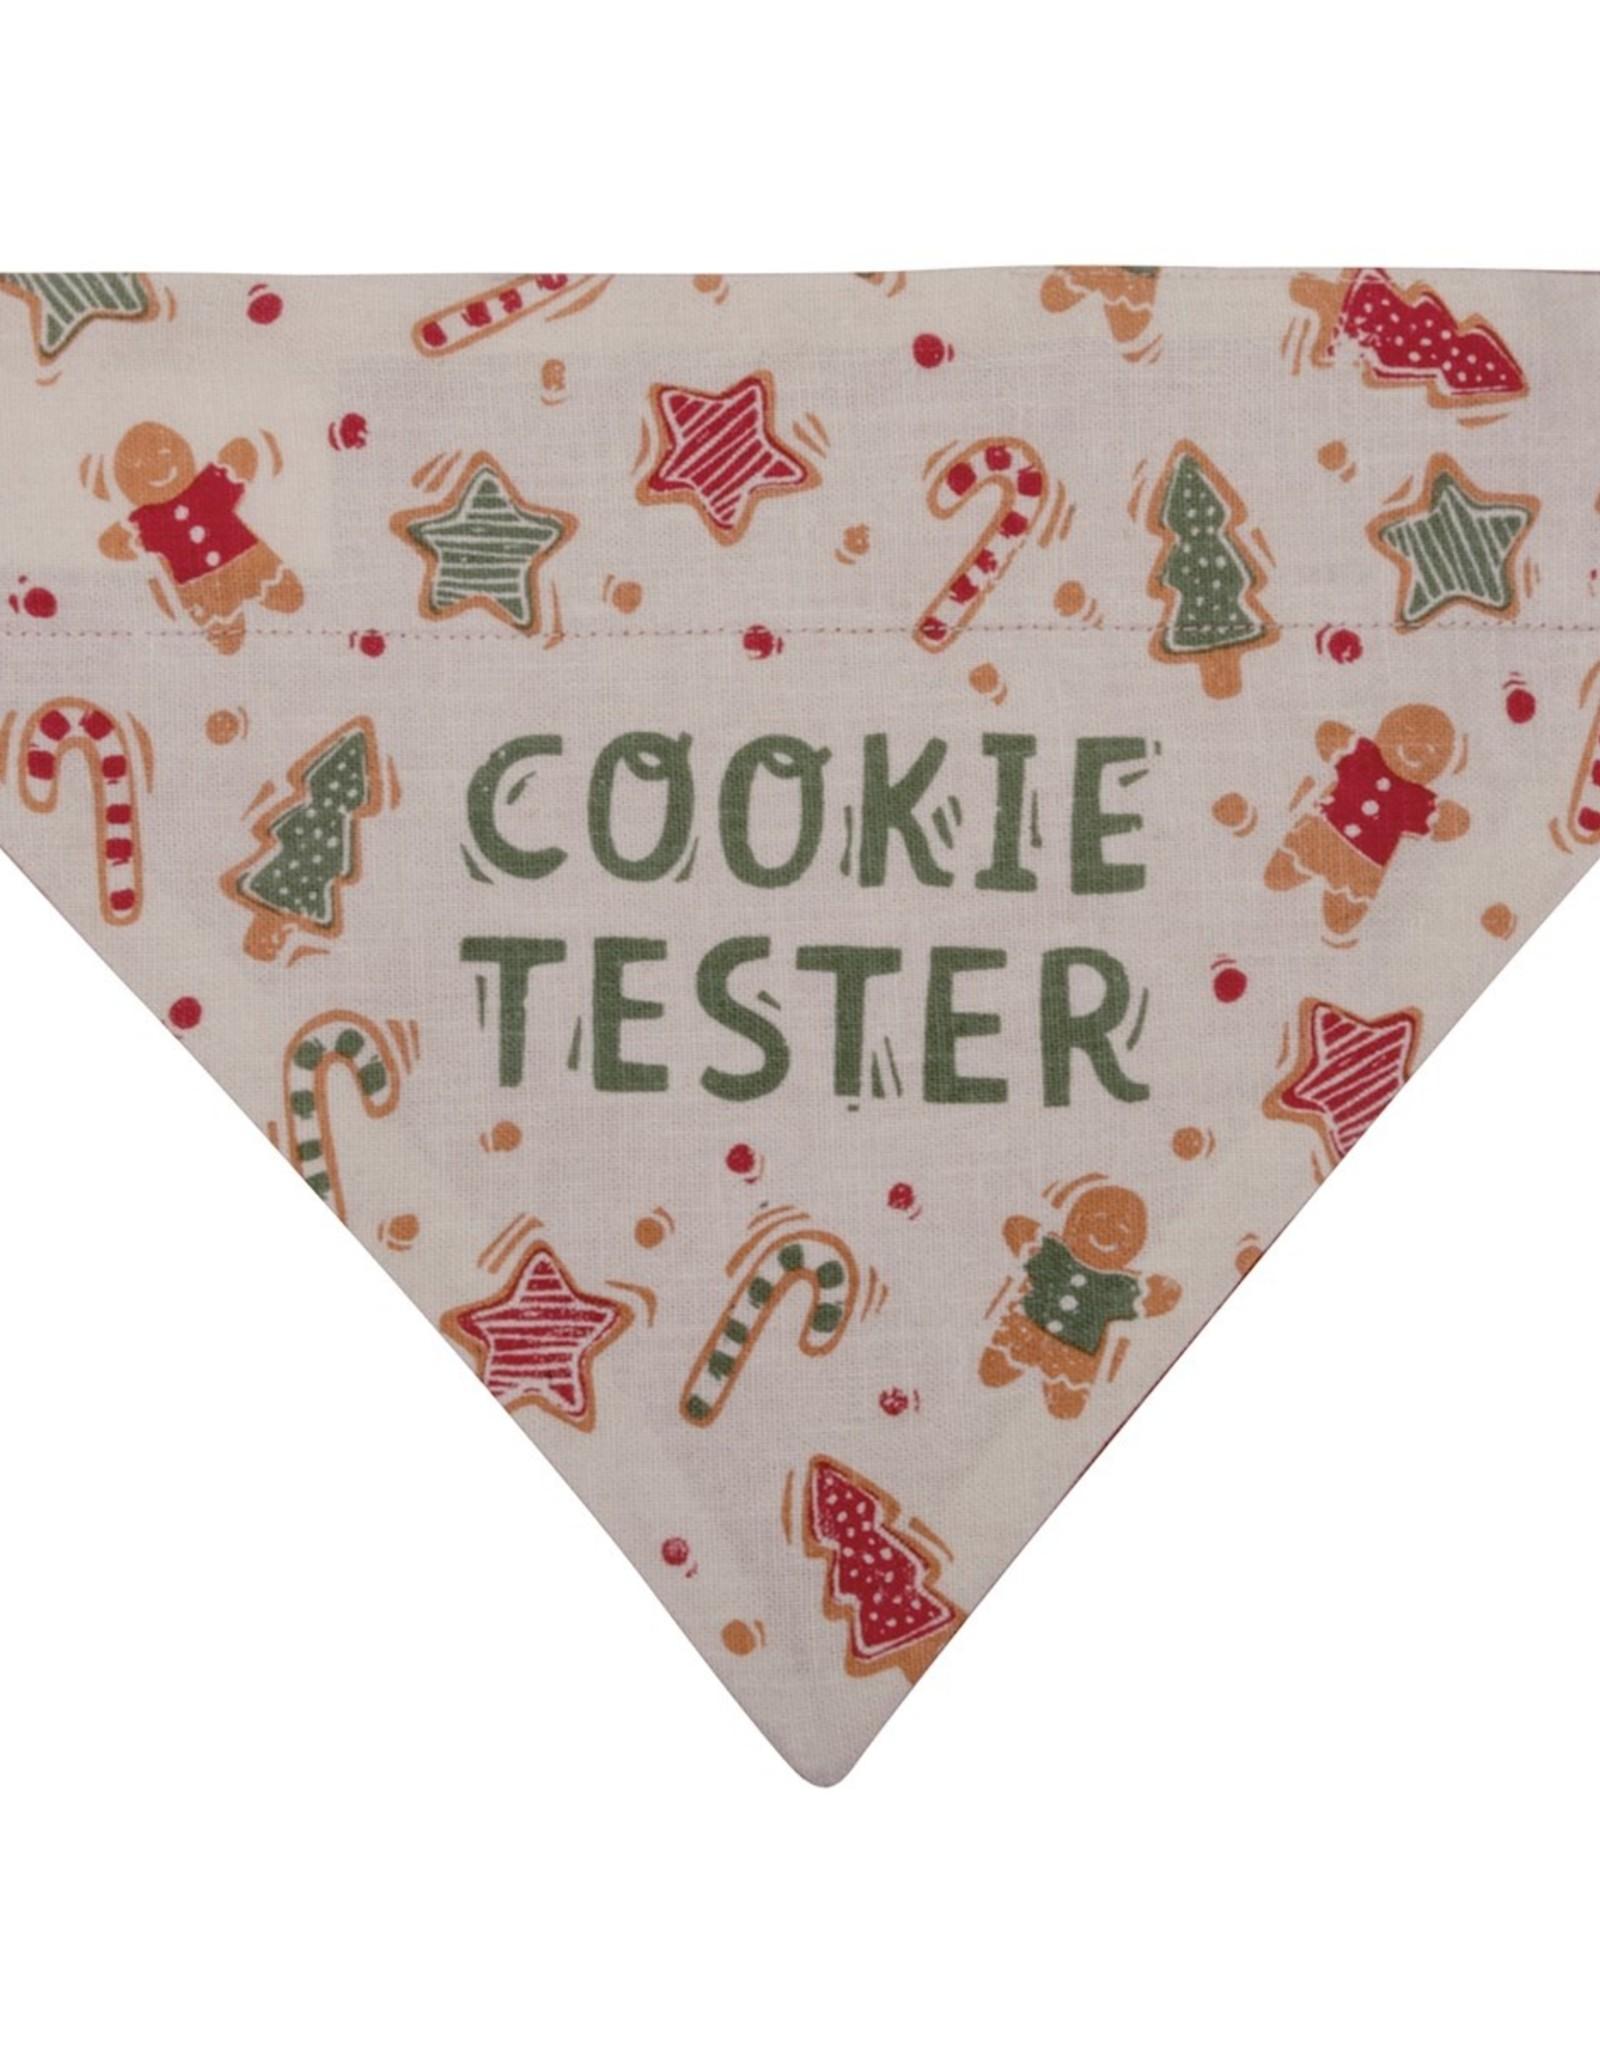 Primitives By Kathy Bandana - Cookie Tester/Wigglebutt Print Slide